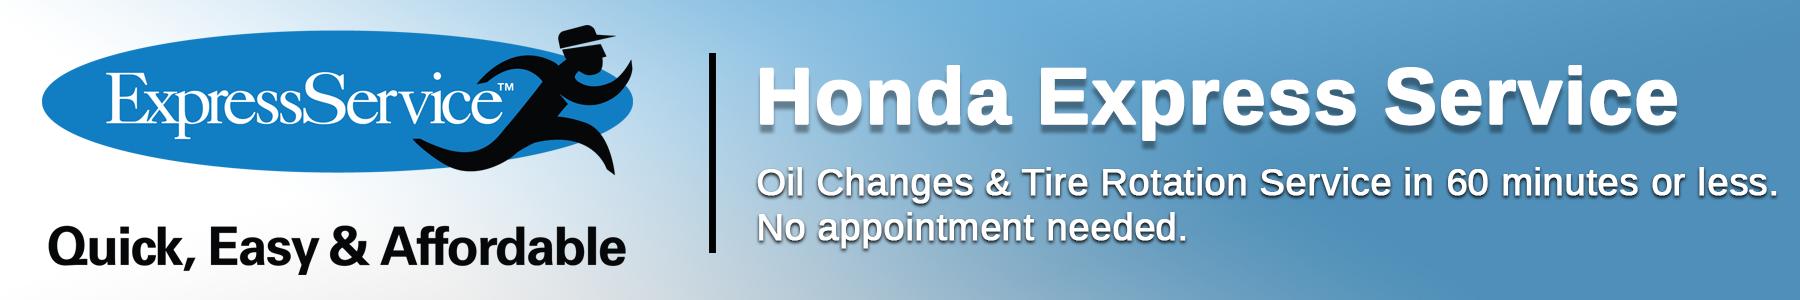 Honda Express Service Massachusetts